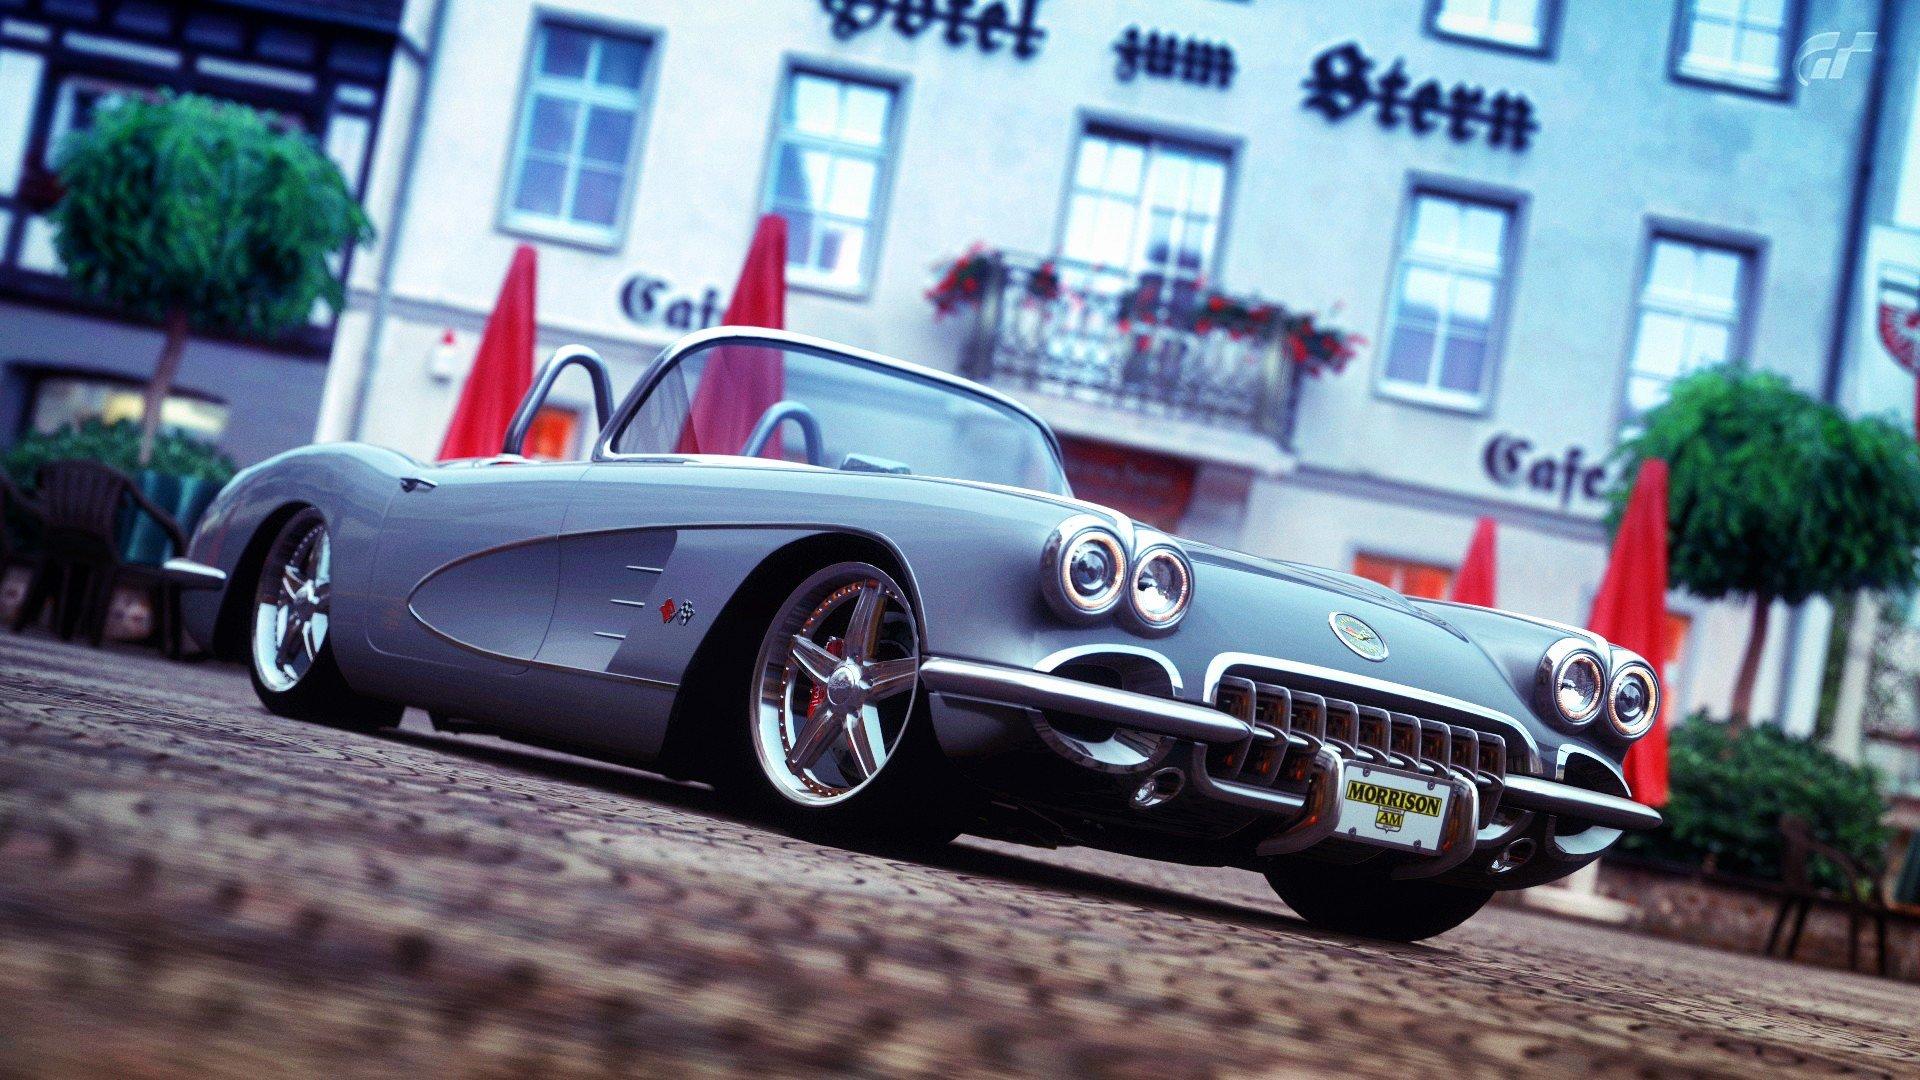 Video Games Cars Chevrolet Corvette Gran Turismo 5 Races